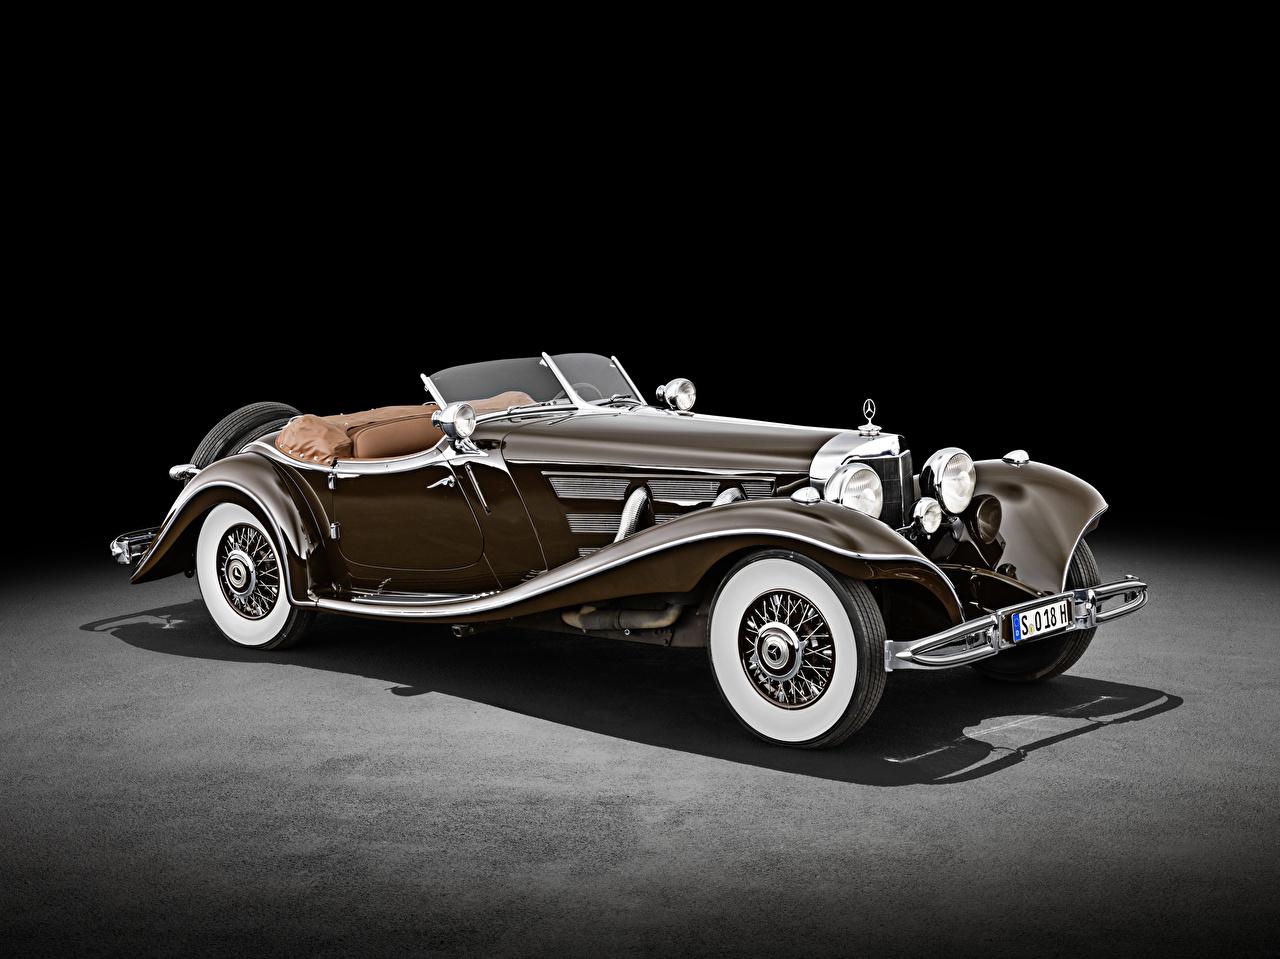 Фото Mercedes-Benz 500 K Special Roadster (W 29), 1934 Родстер Ретро коричневая машина Мерседес бенц винтаж старинные коричневые Коричневый авто машины Автомобили автомобиль